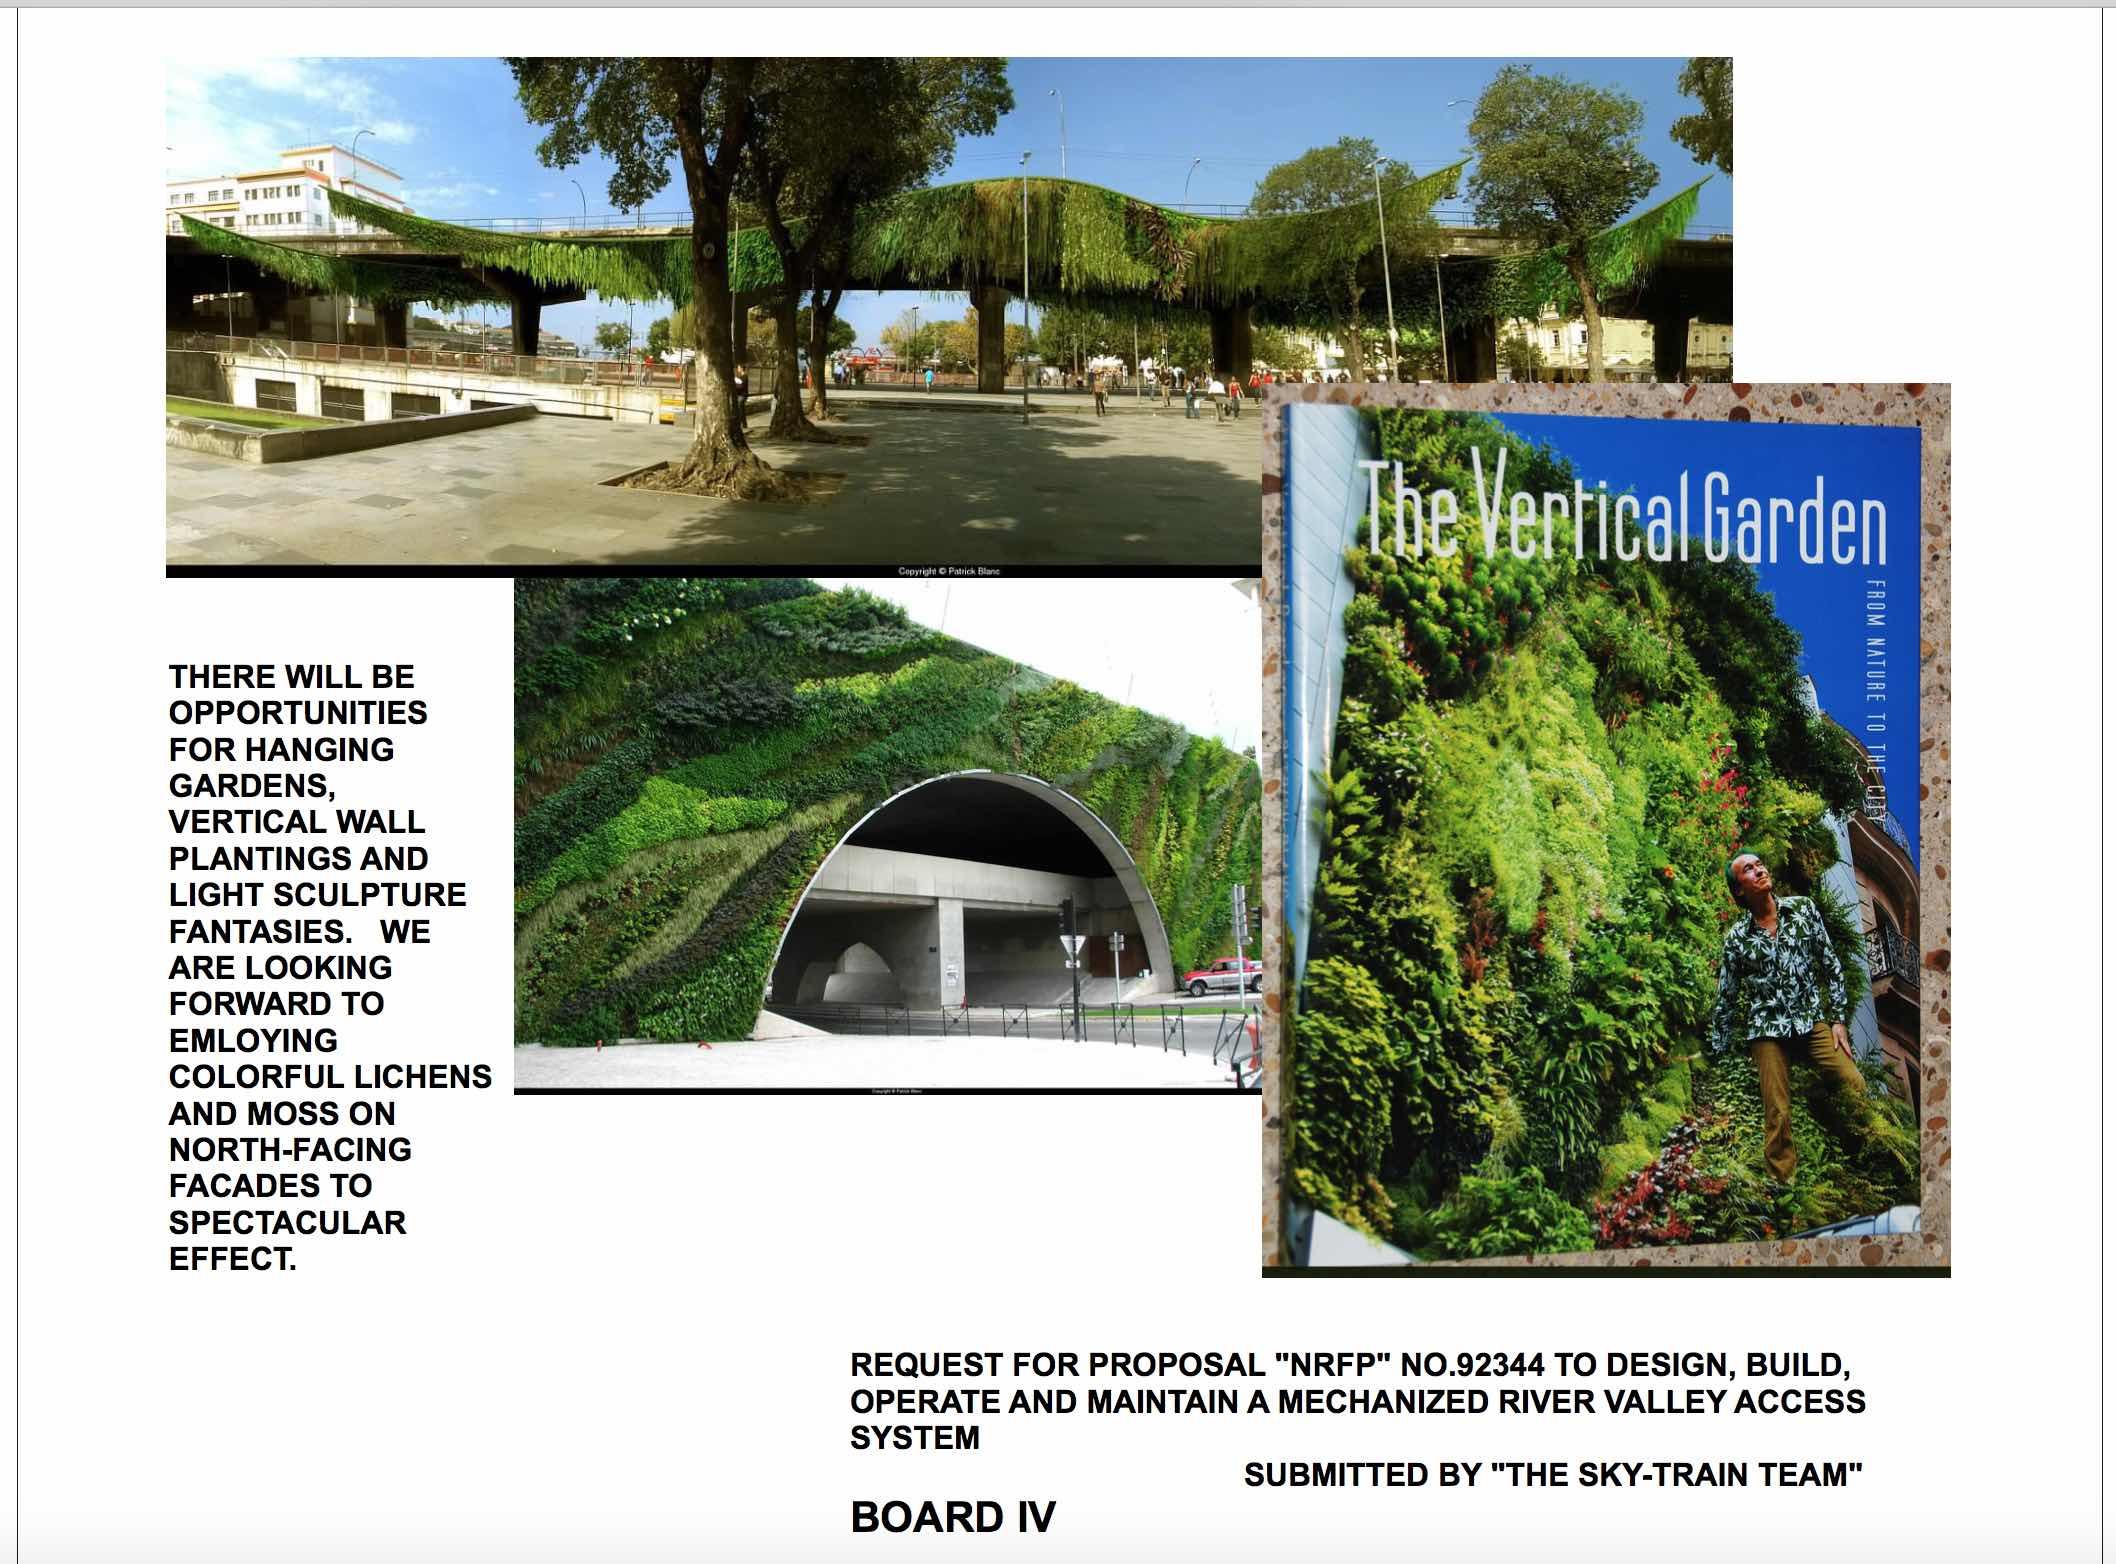 MRVAS river valey concepts